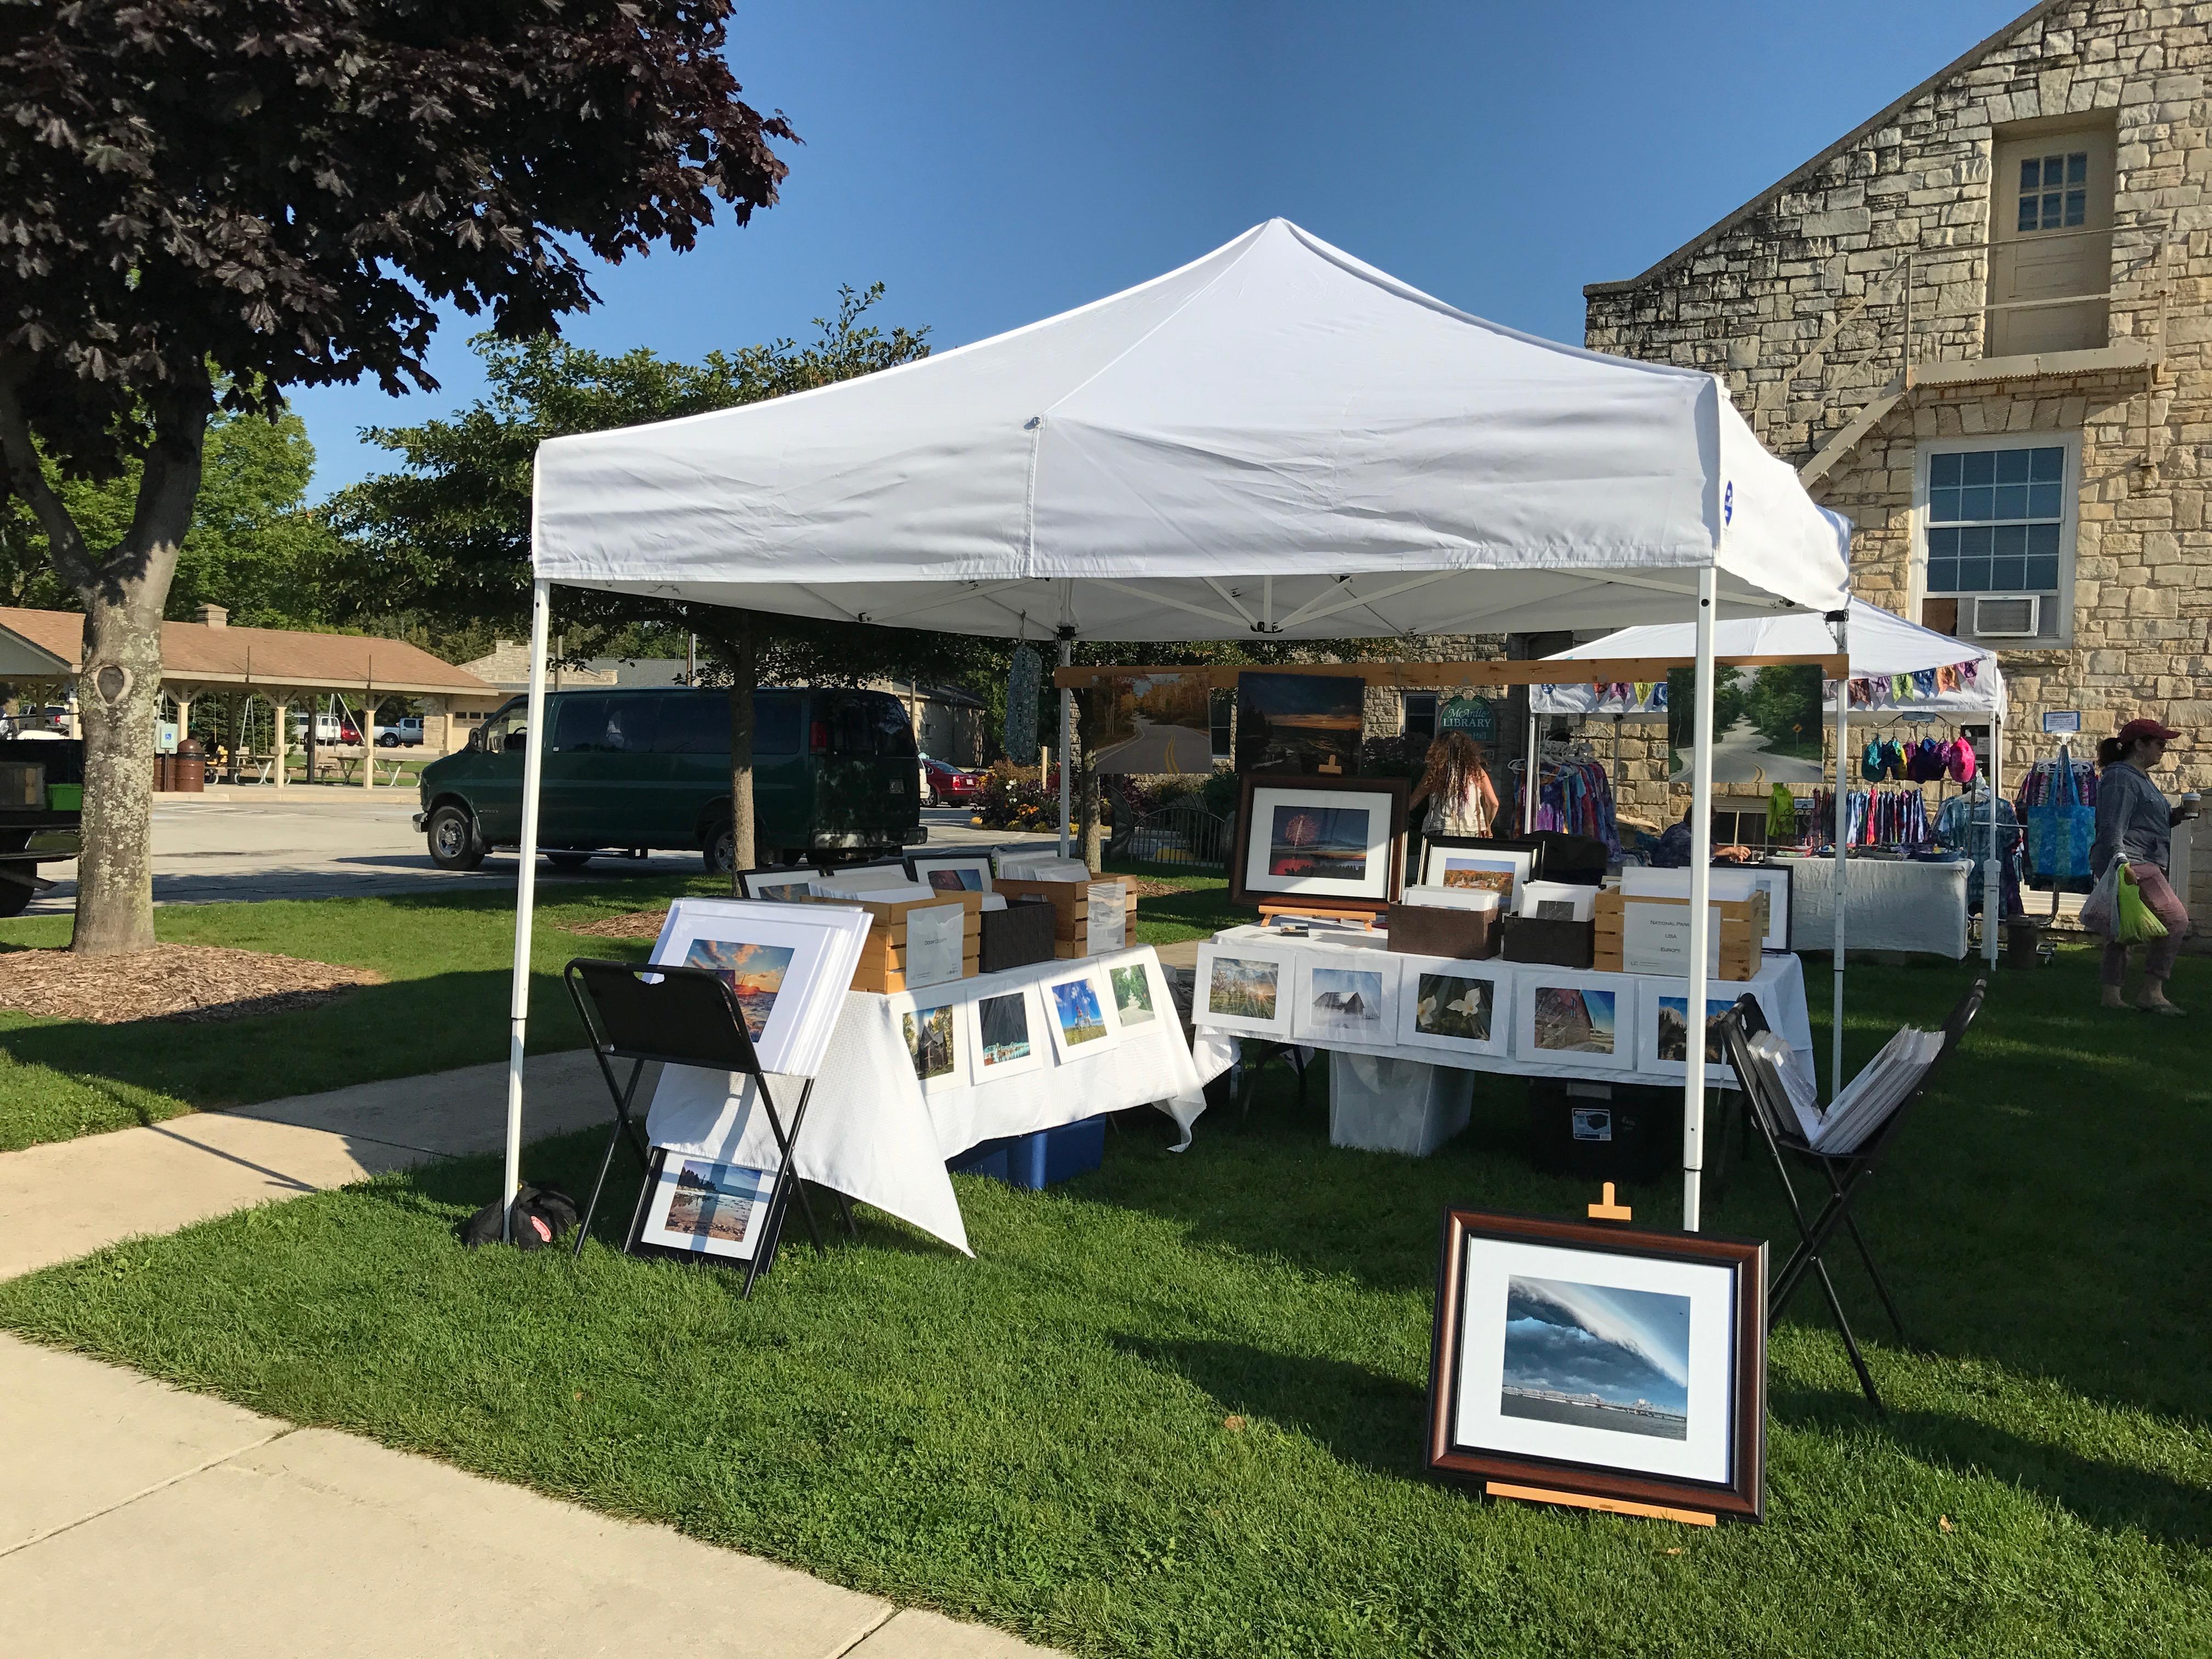 door county, farmers market, prints, baileys harbor, sturgeon bay, art fair, crafts, print sale